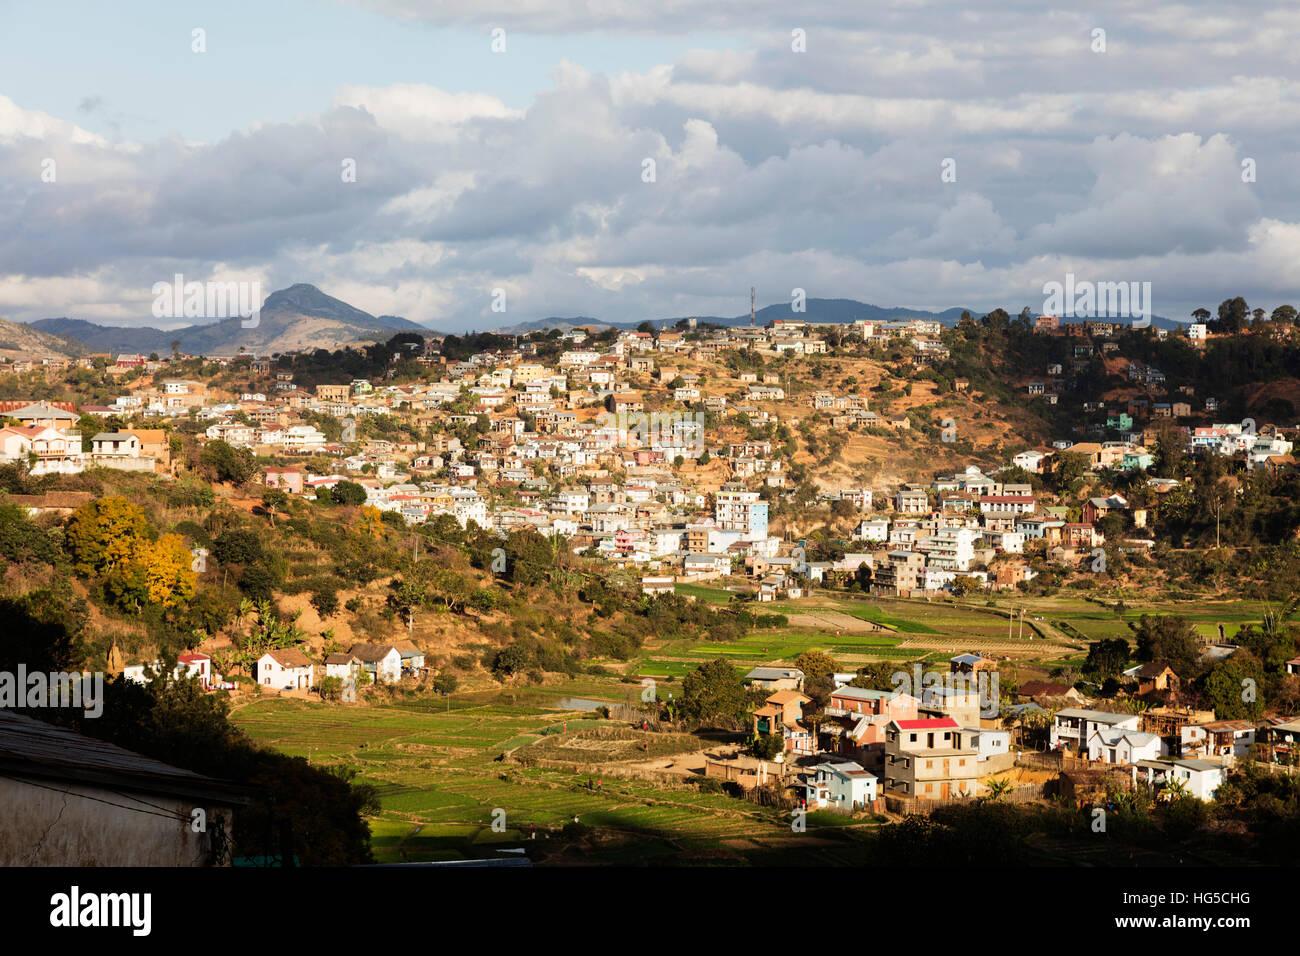 Fianarantsoa, central area - Stock Image